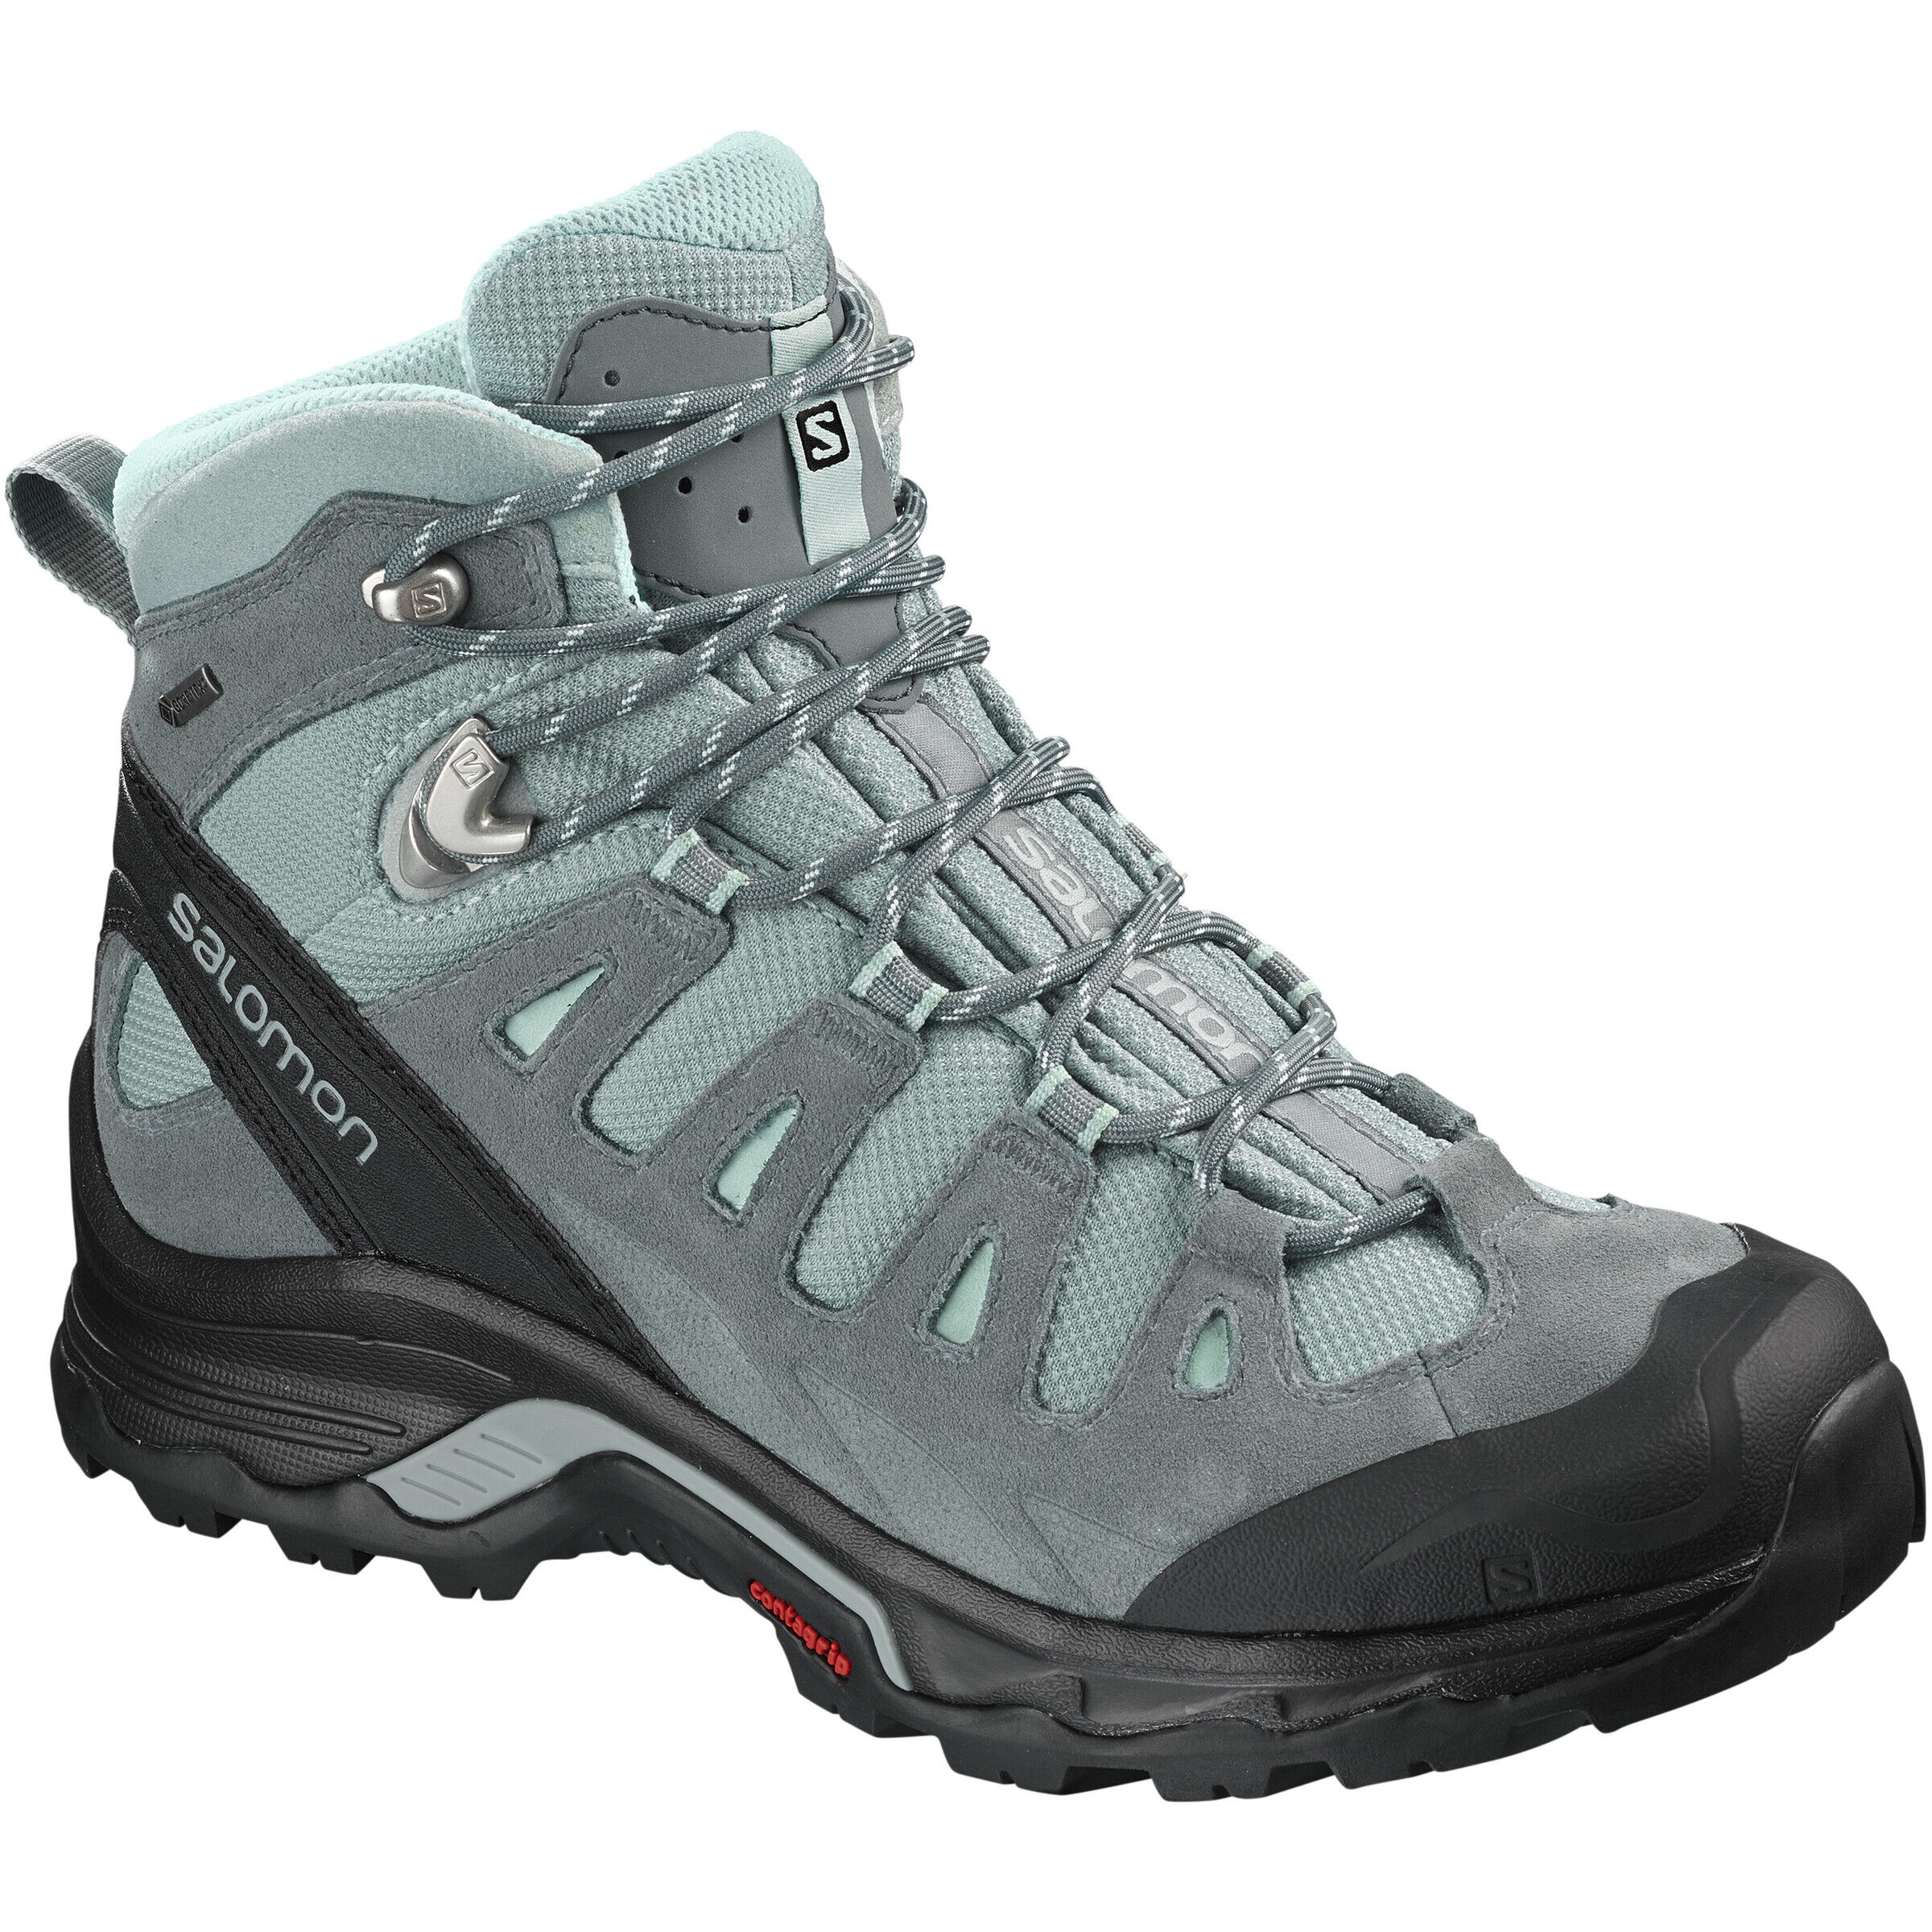 Salomon Authentic LTR GTX Schuhe Damen leadstormy weathereggshell blue